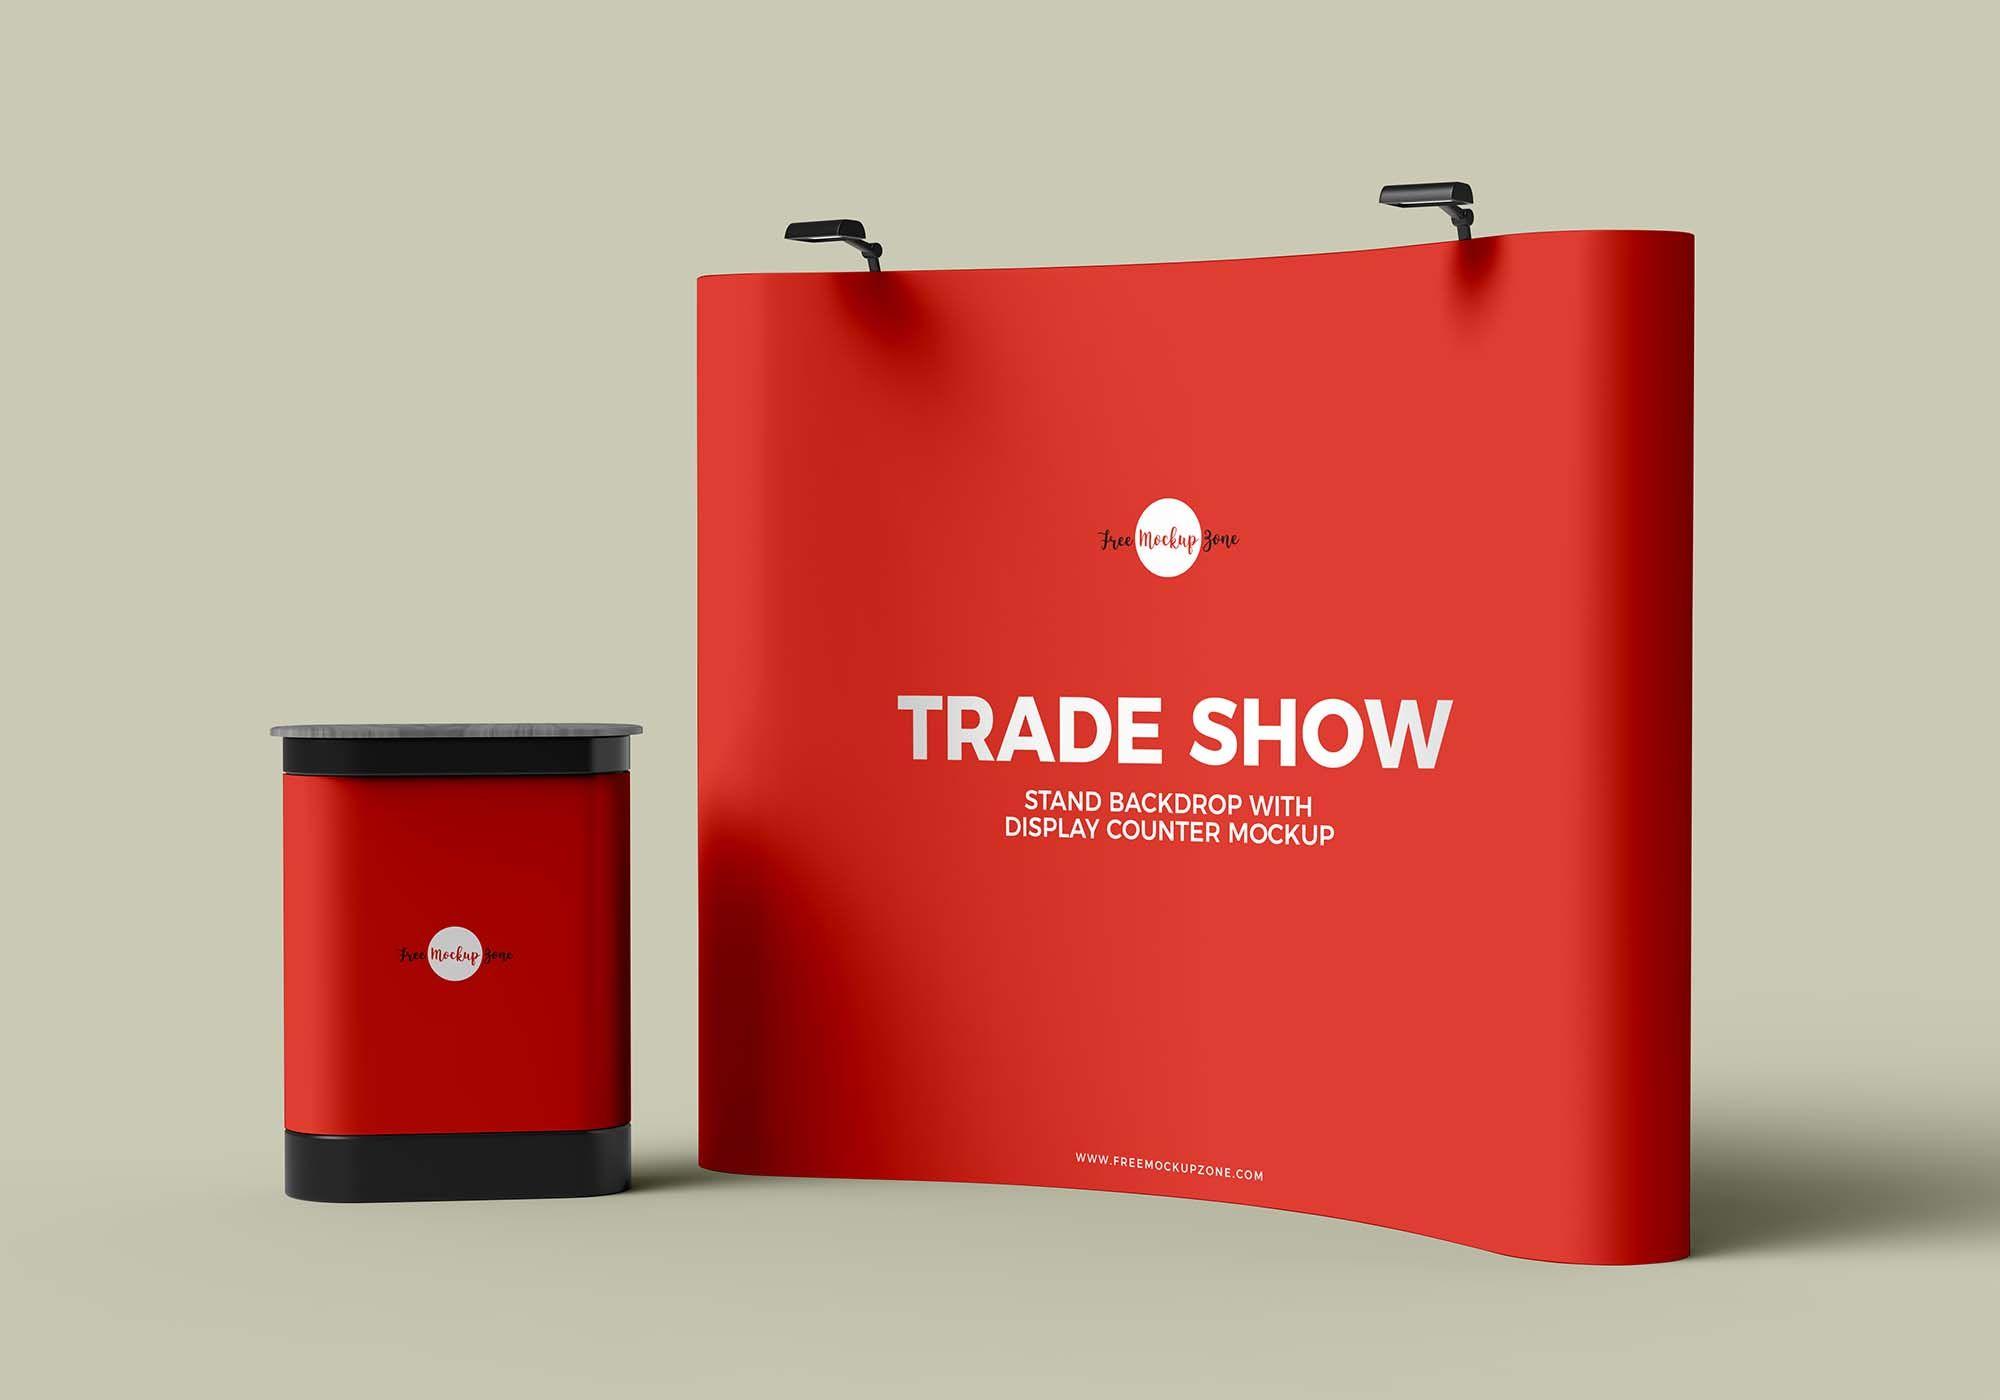 Free Trade Show Stand Mockup Psd Tradeshow Banner Free Mockup Mockup Free Psd